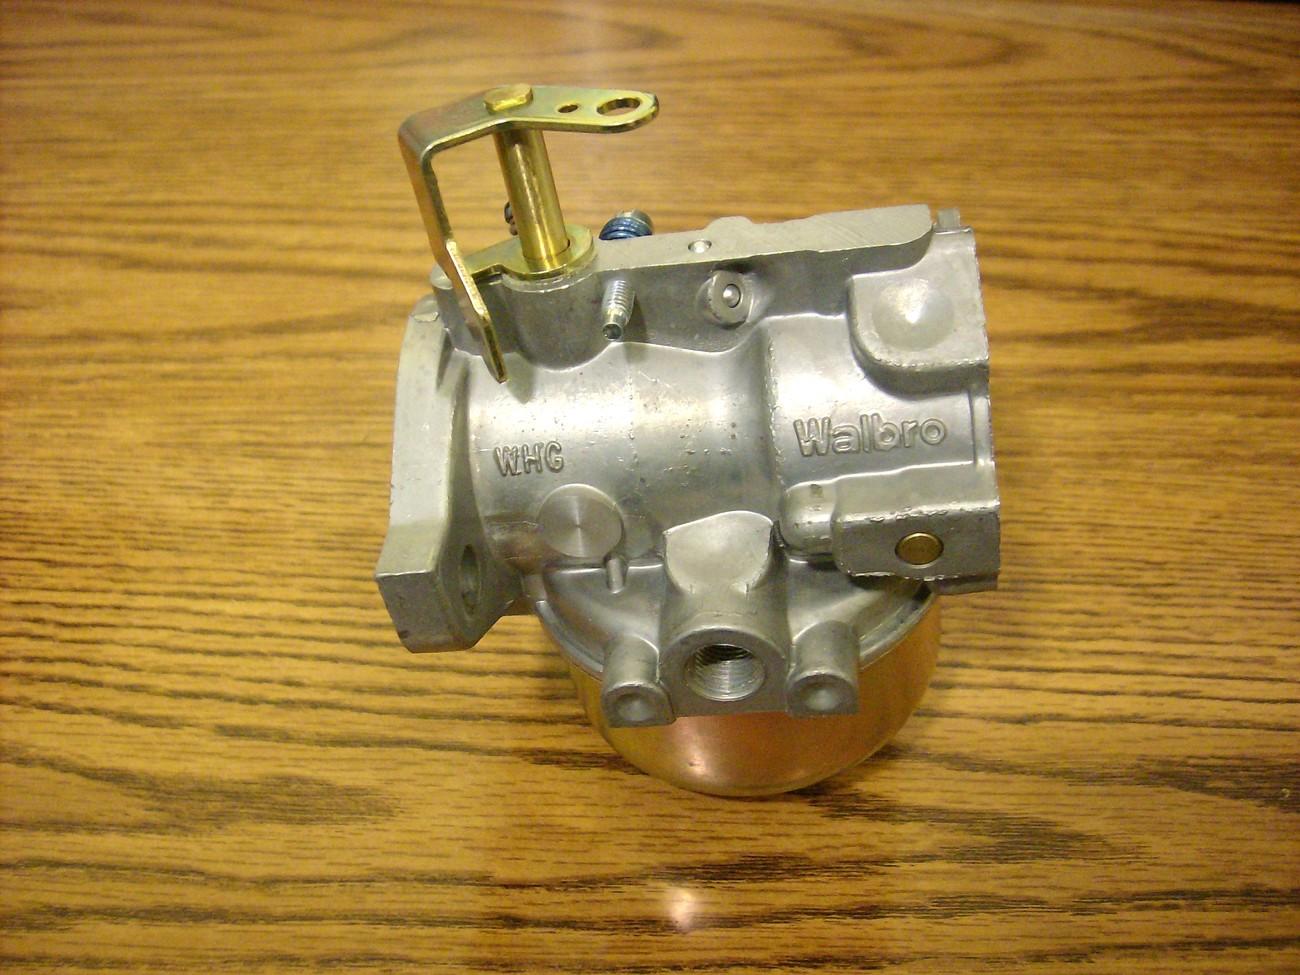 Kohler K301 carburetor 4785323S used on John Deere, Cub Cadet and others